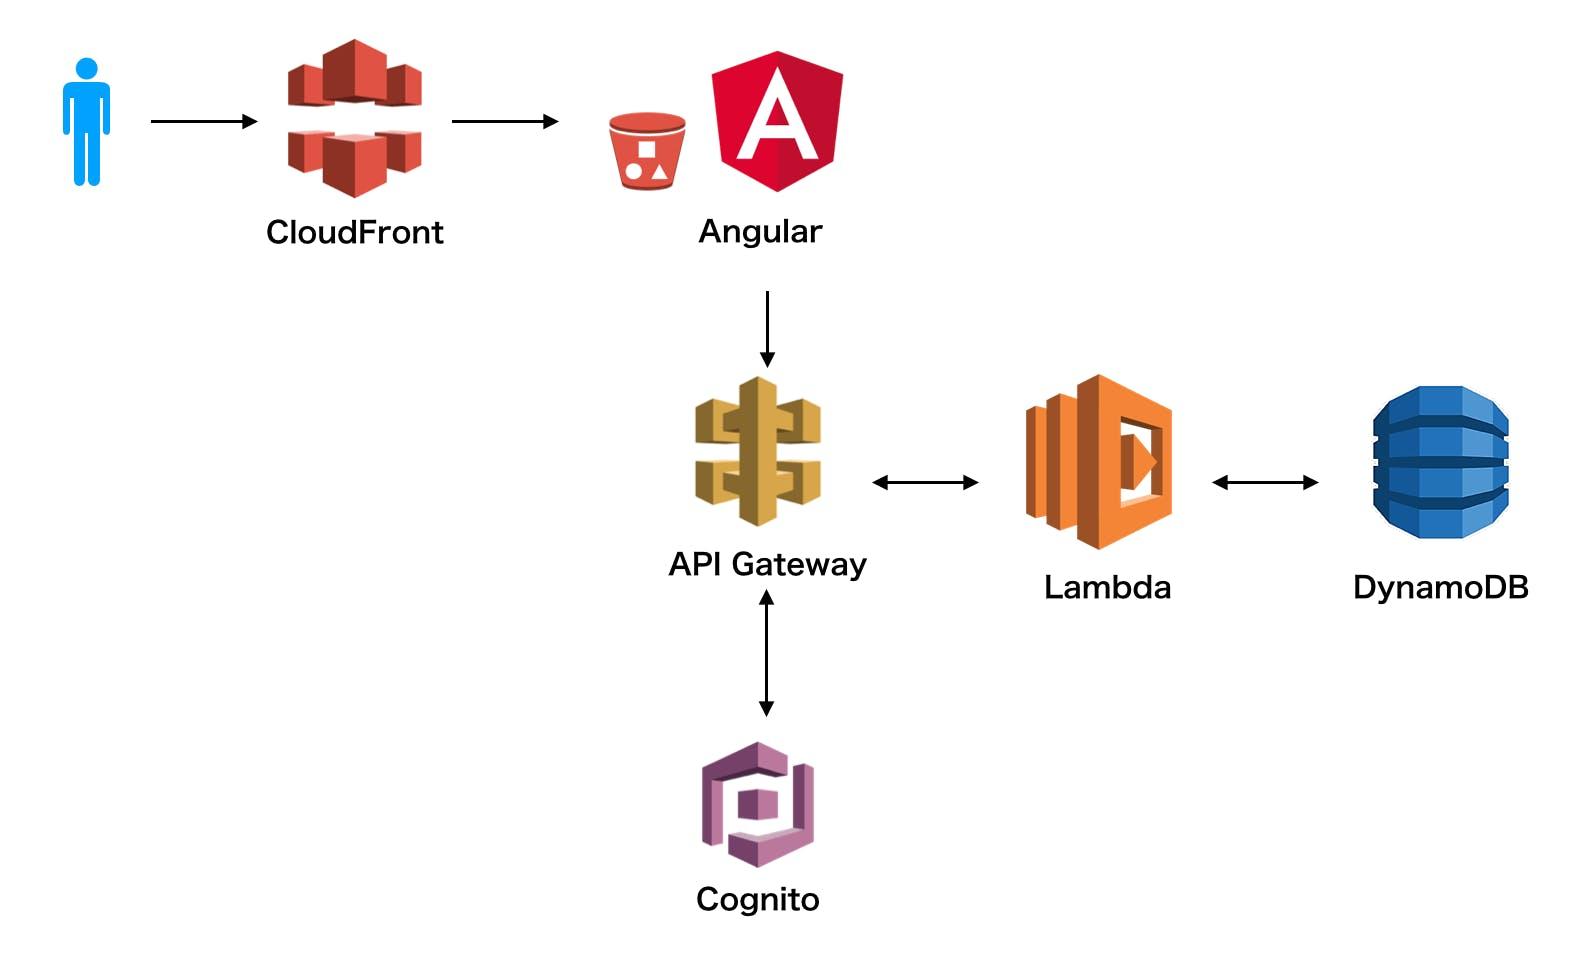 Serverless + AngularでSPAを作った話 - Qiita